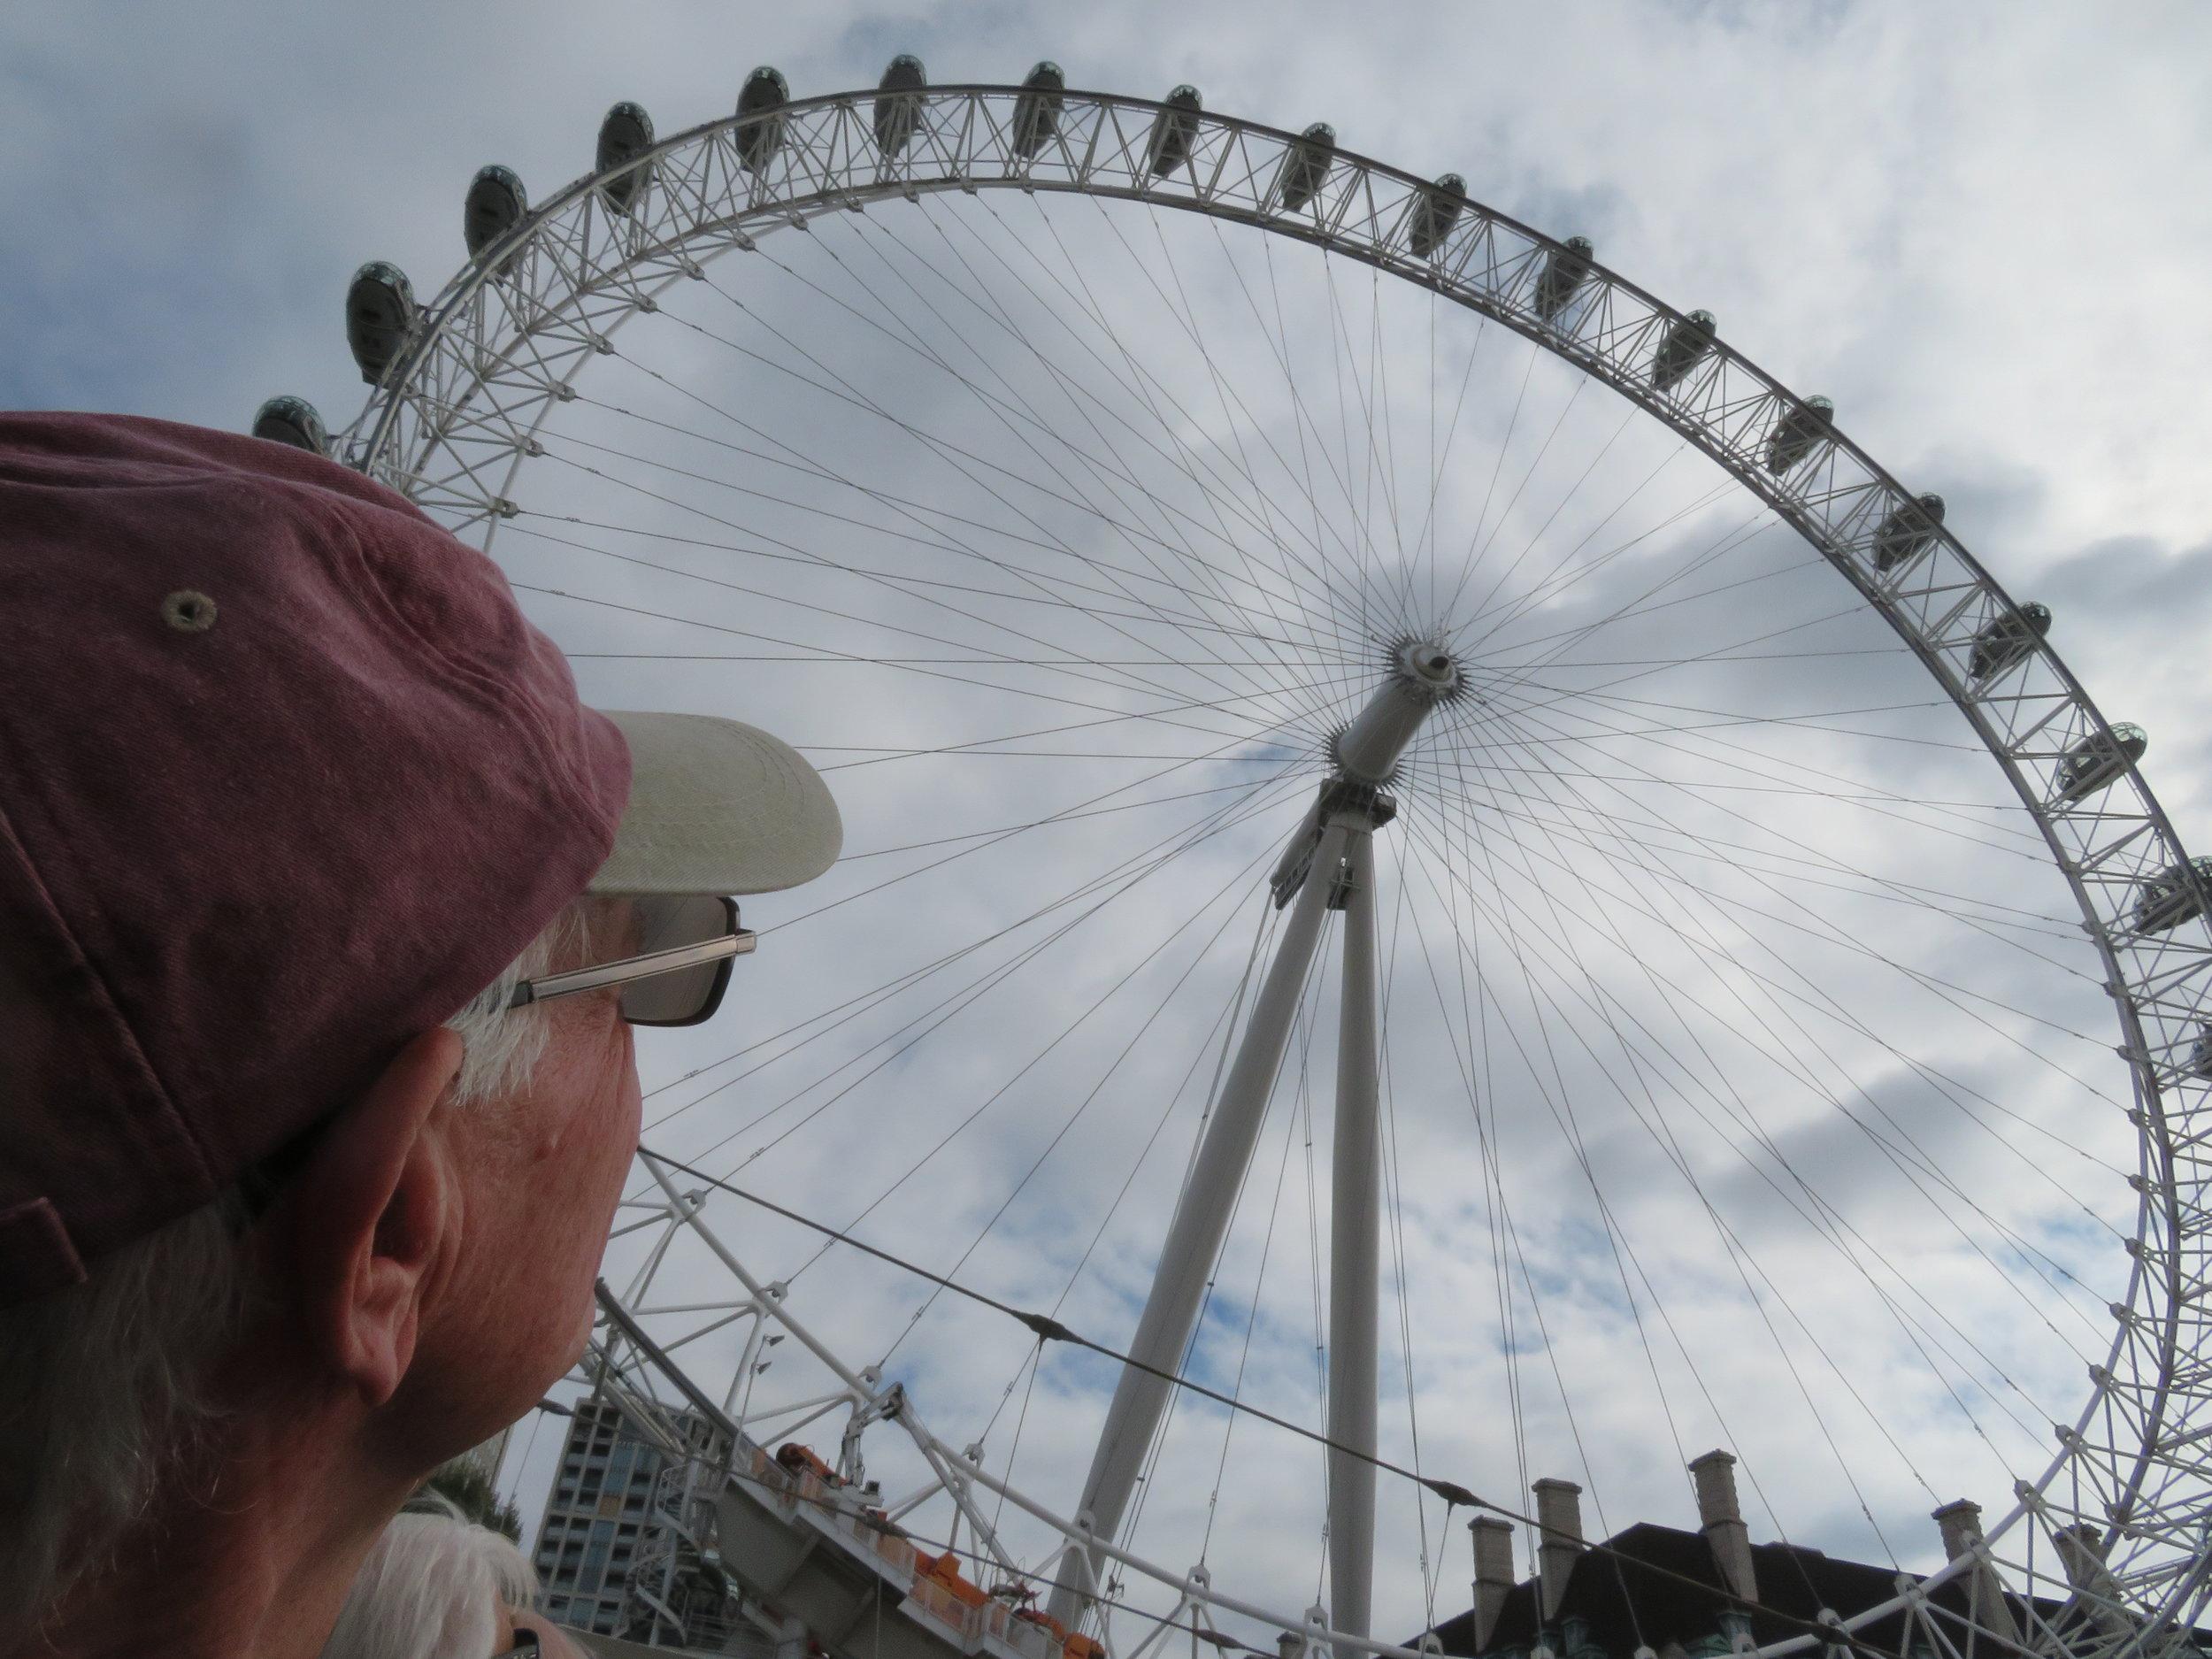 The London Eye is London's iconic giant ferris wheel.